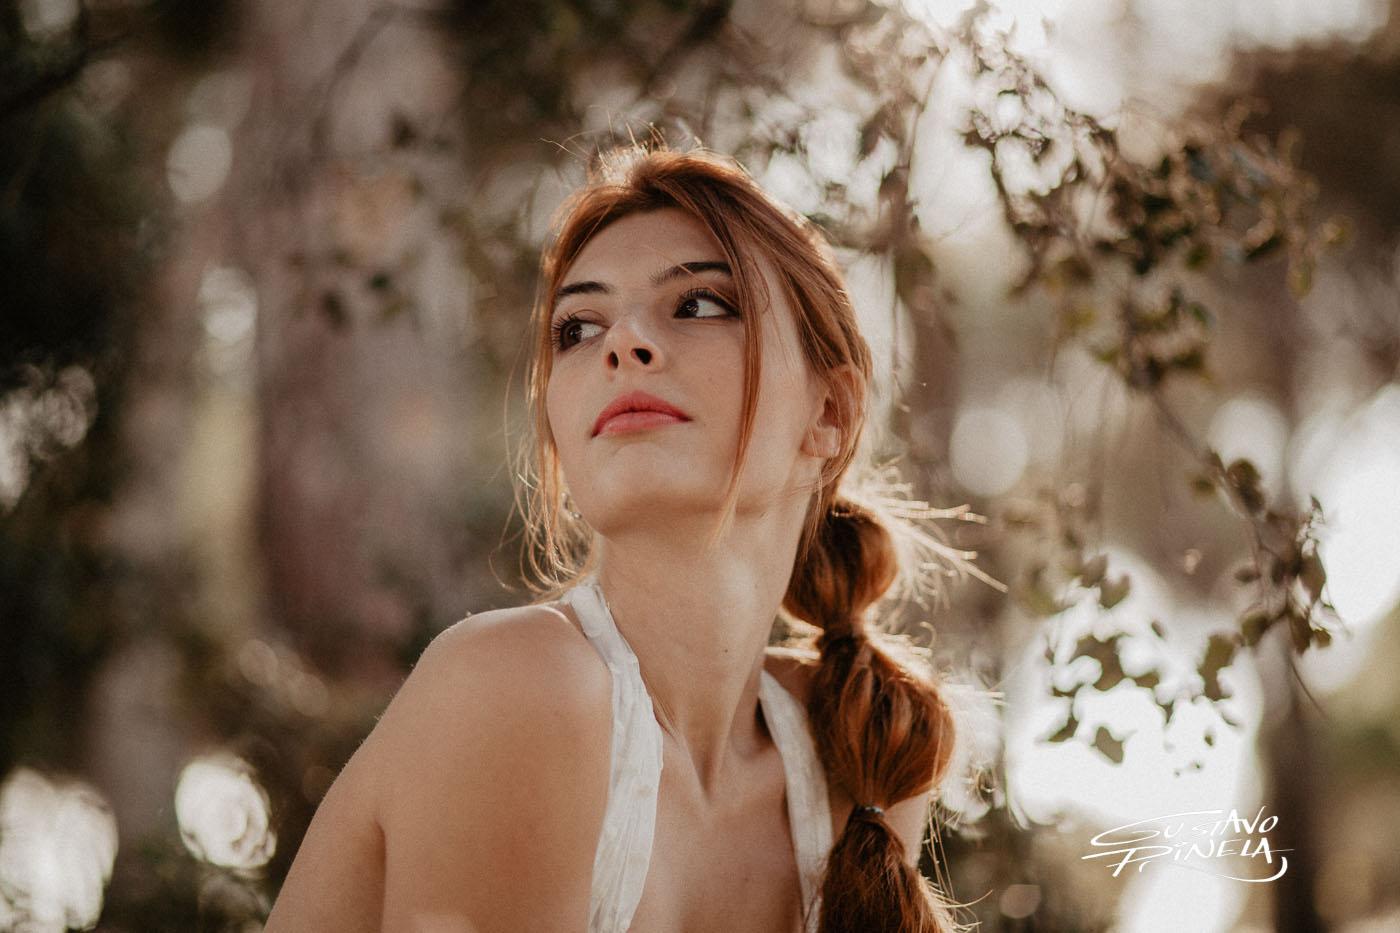 Bodas - Gustavo Pinela. Natural and spontaneous wedding photography